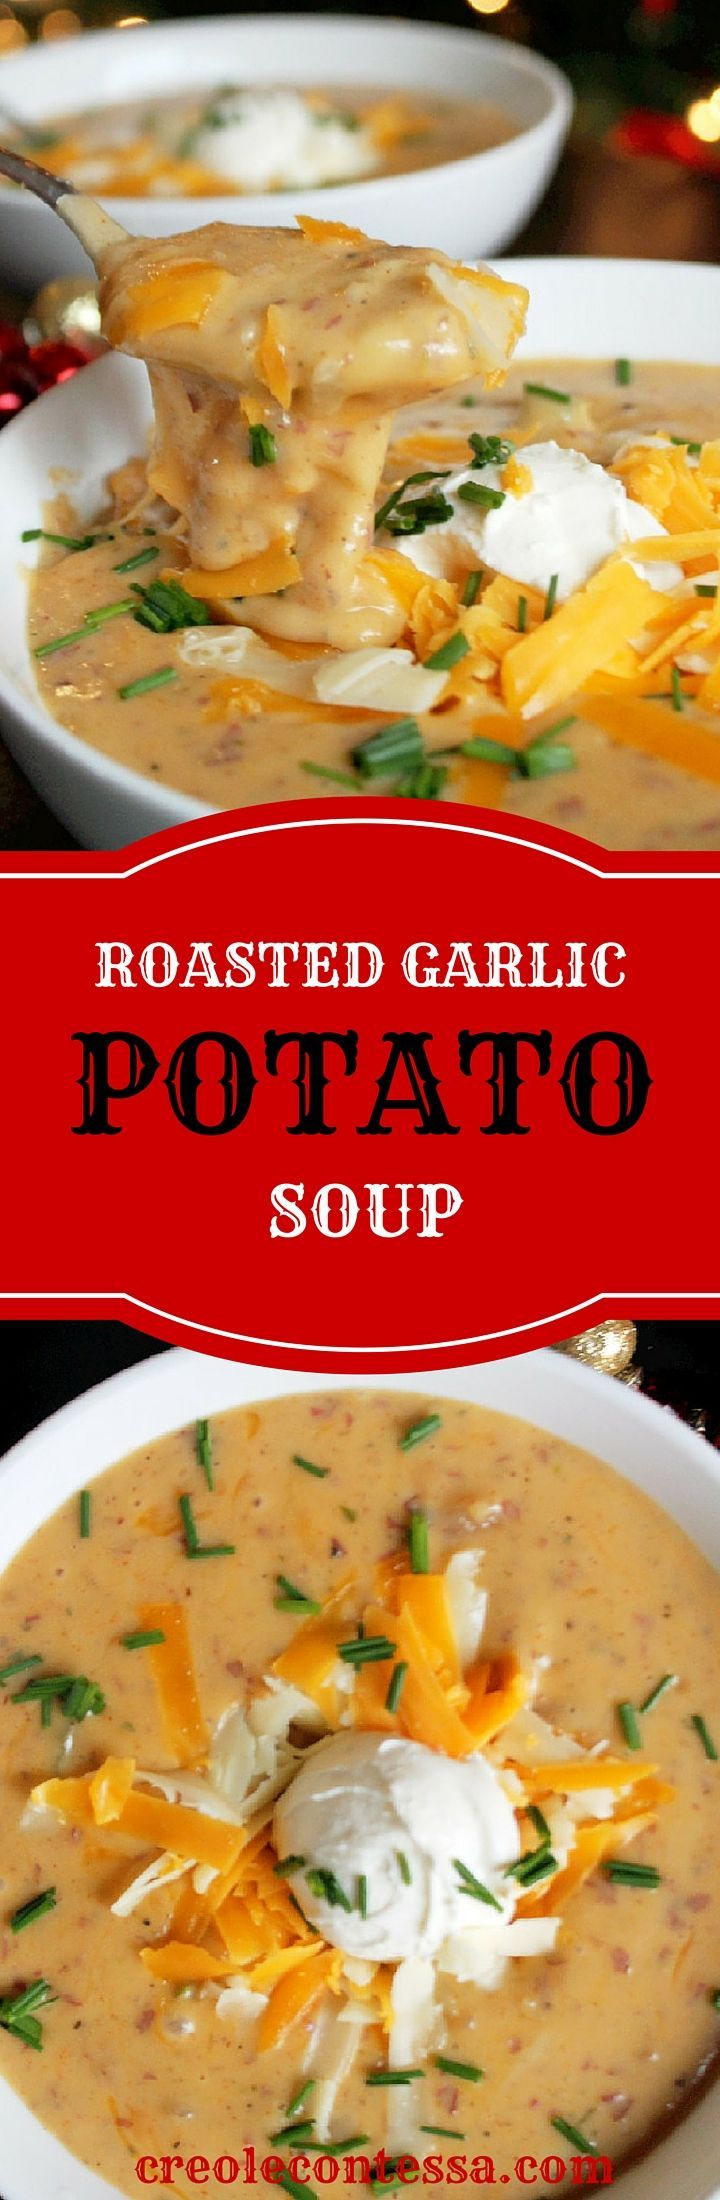 Slow Cooker Roasted Garlic Baked Potato Soup-Creole Contessa